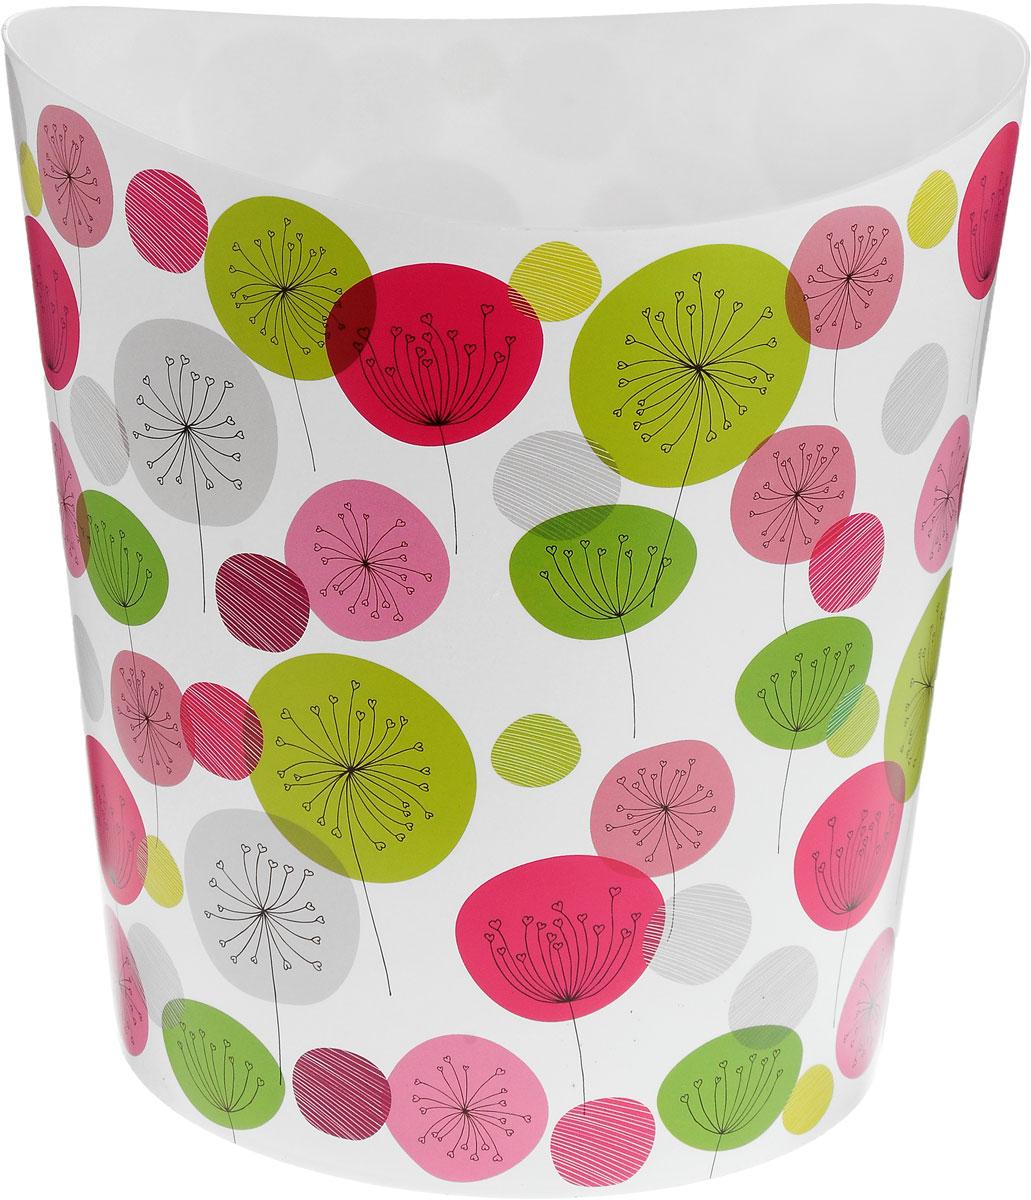 Корзина для бумаг Idea  Деко. Одуваны , 25 х 26 х 28 см -  Корзины для бумаг